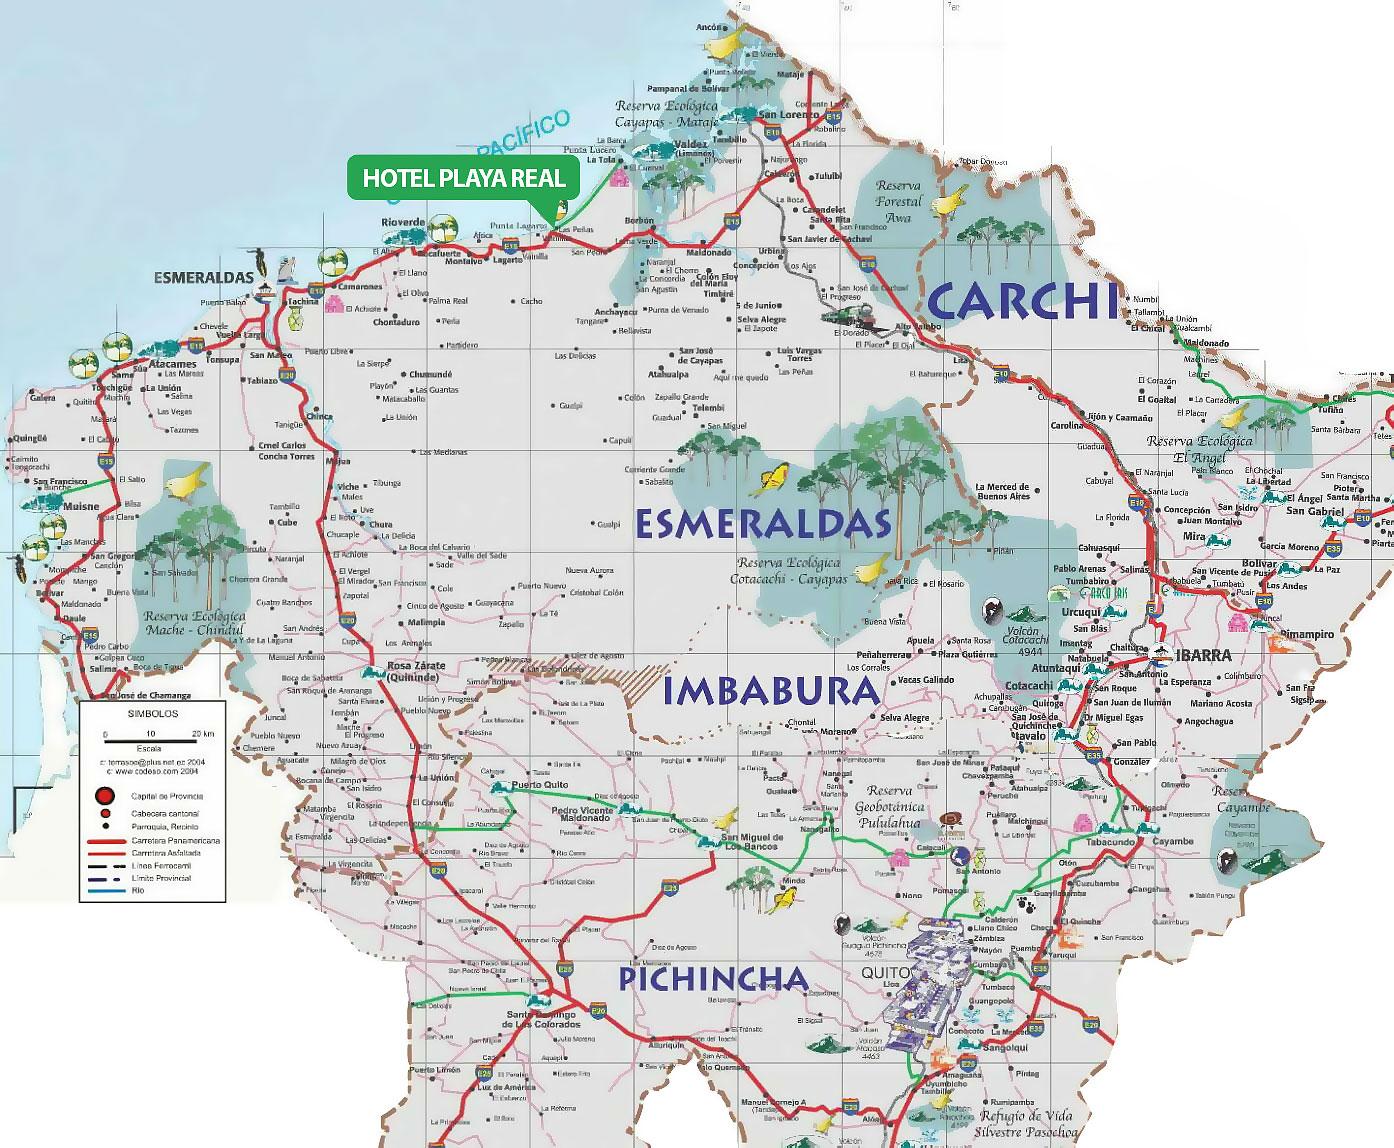 galapagos islands map google with Ecuador Map Esmeralda on Charles Darwin Google Doodle further Ecuador Map Esmeralda together with 2016 03 01 archive besides British isles moreover Puerto Baquerizo Moreno.